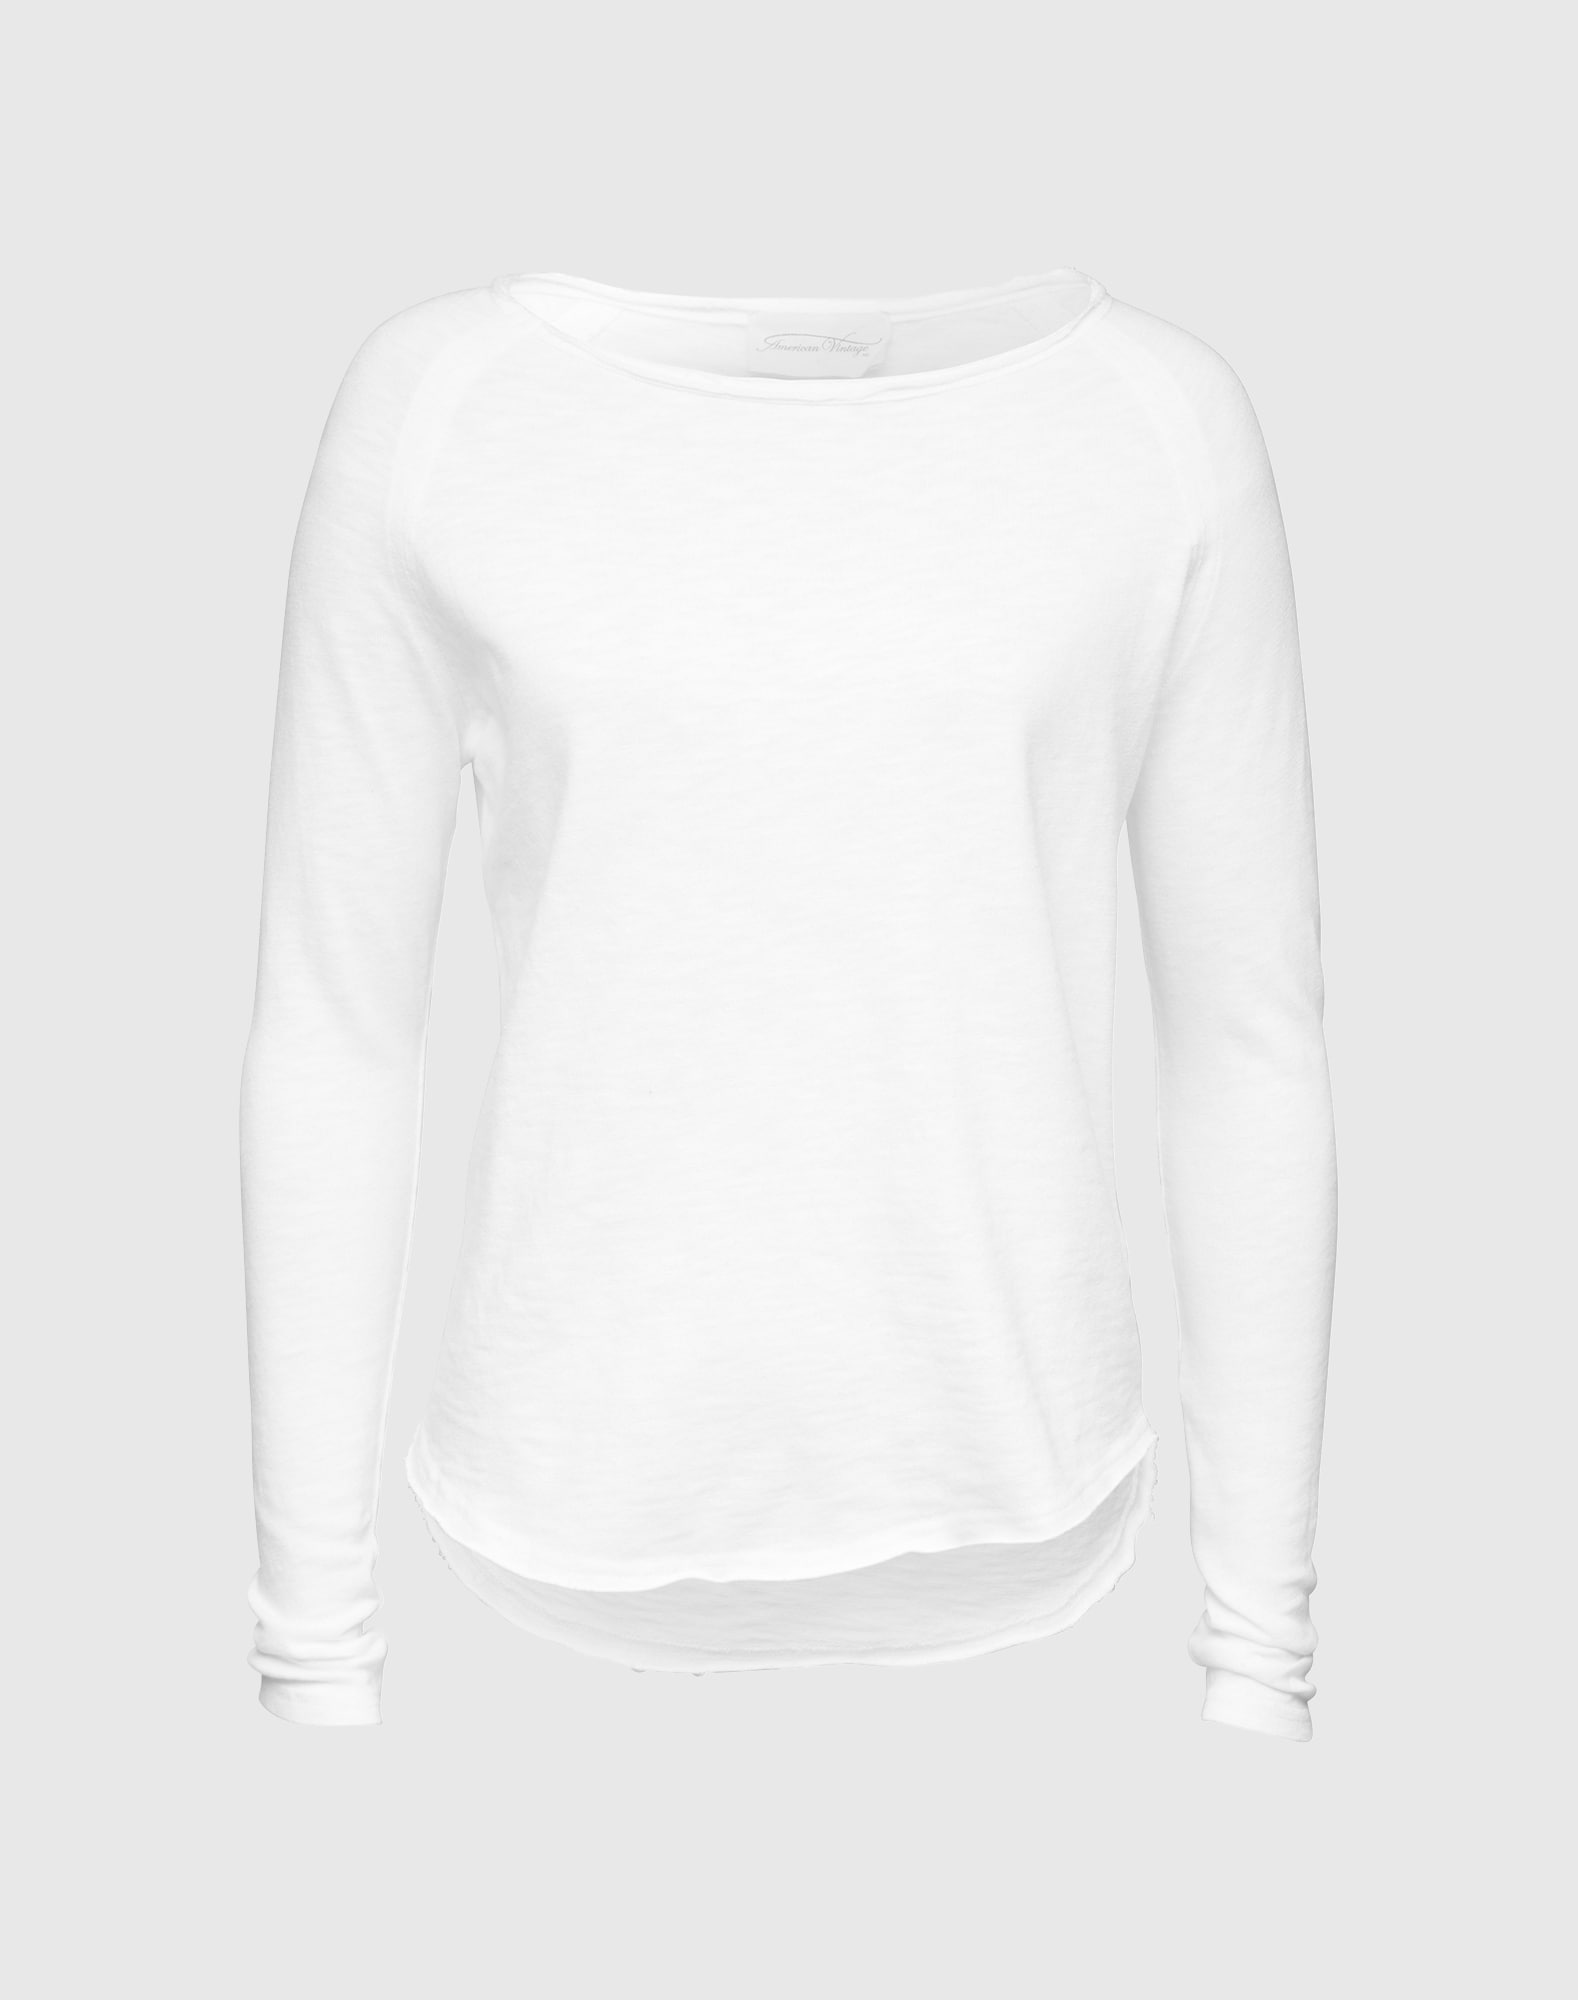 AMERICAN VINTAGE, Dames Shirt 'Sonoma', wit